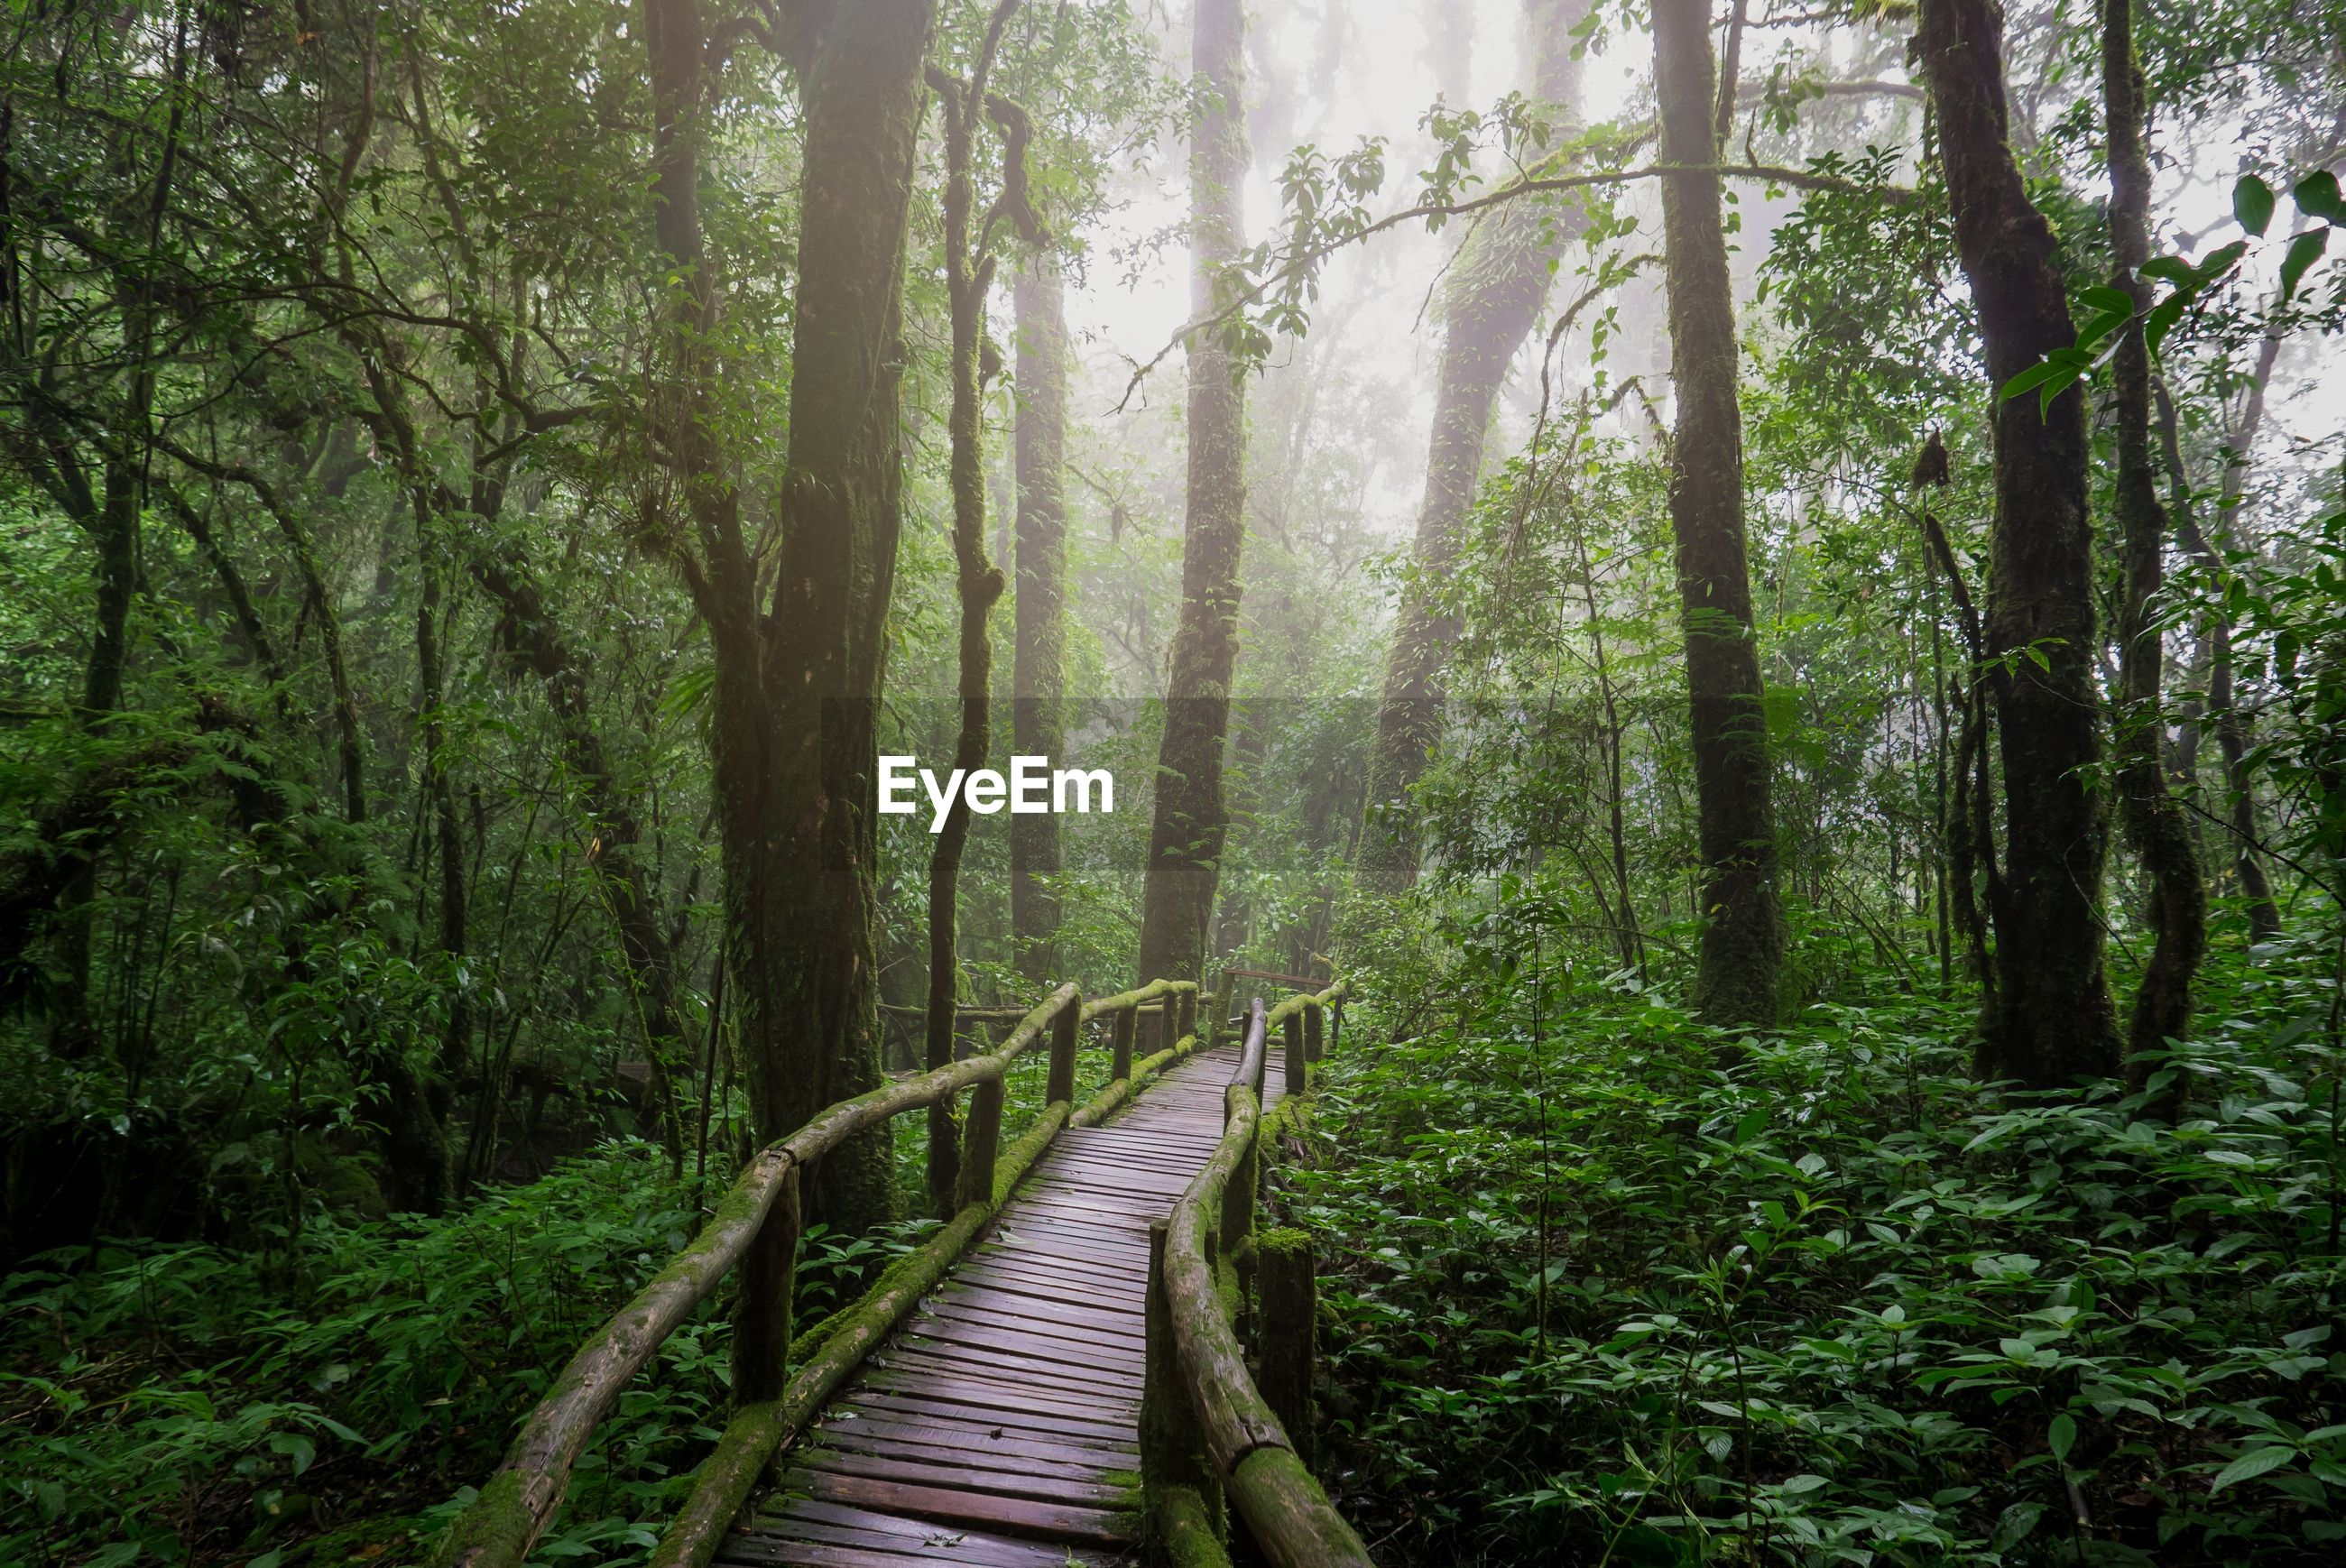 Natural rainforest study path.